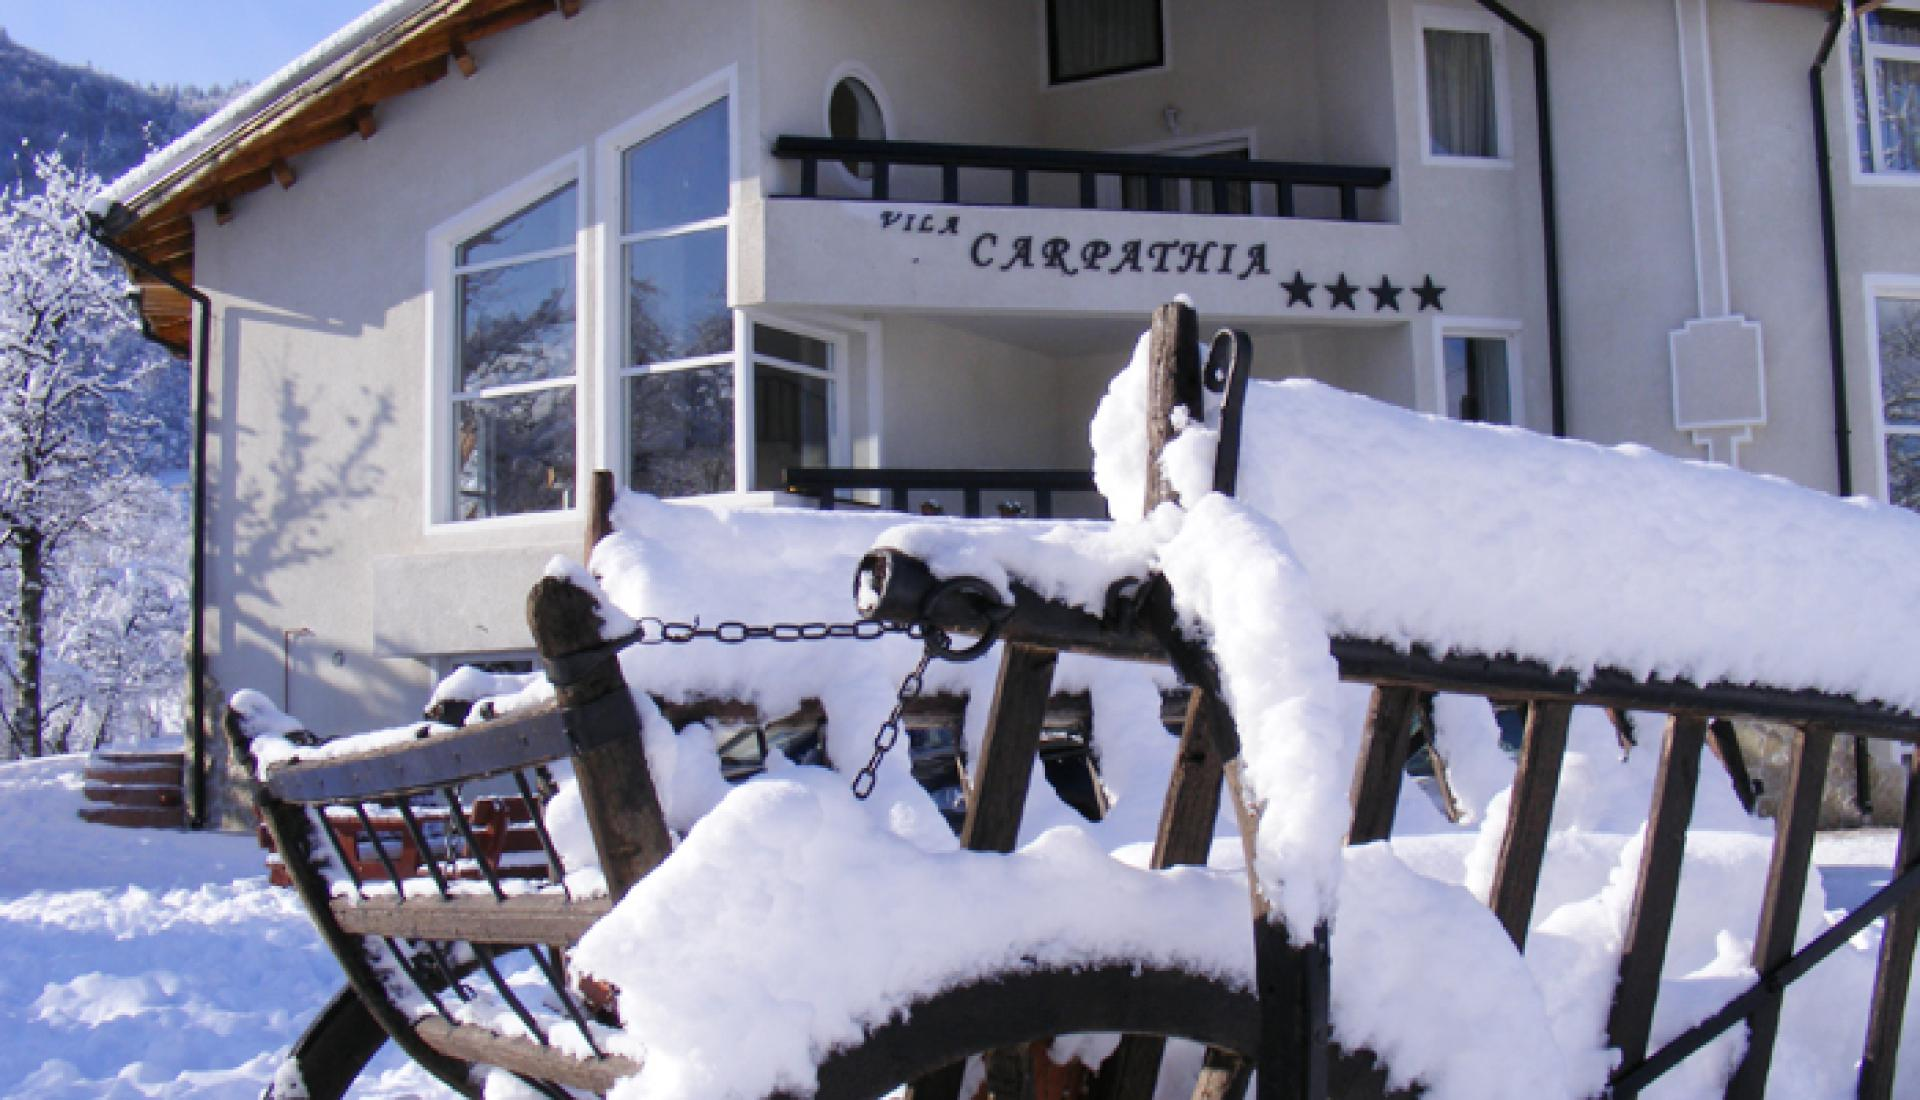 Cazare iarna Carpathia